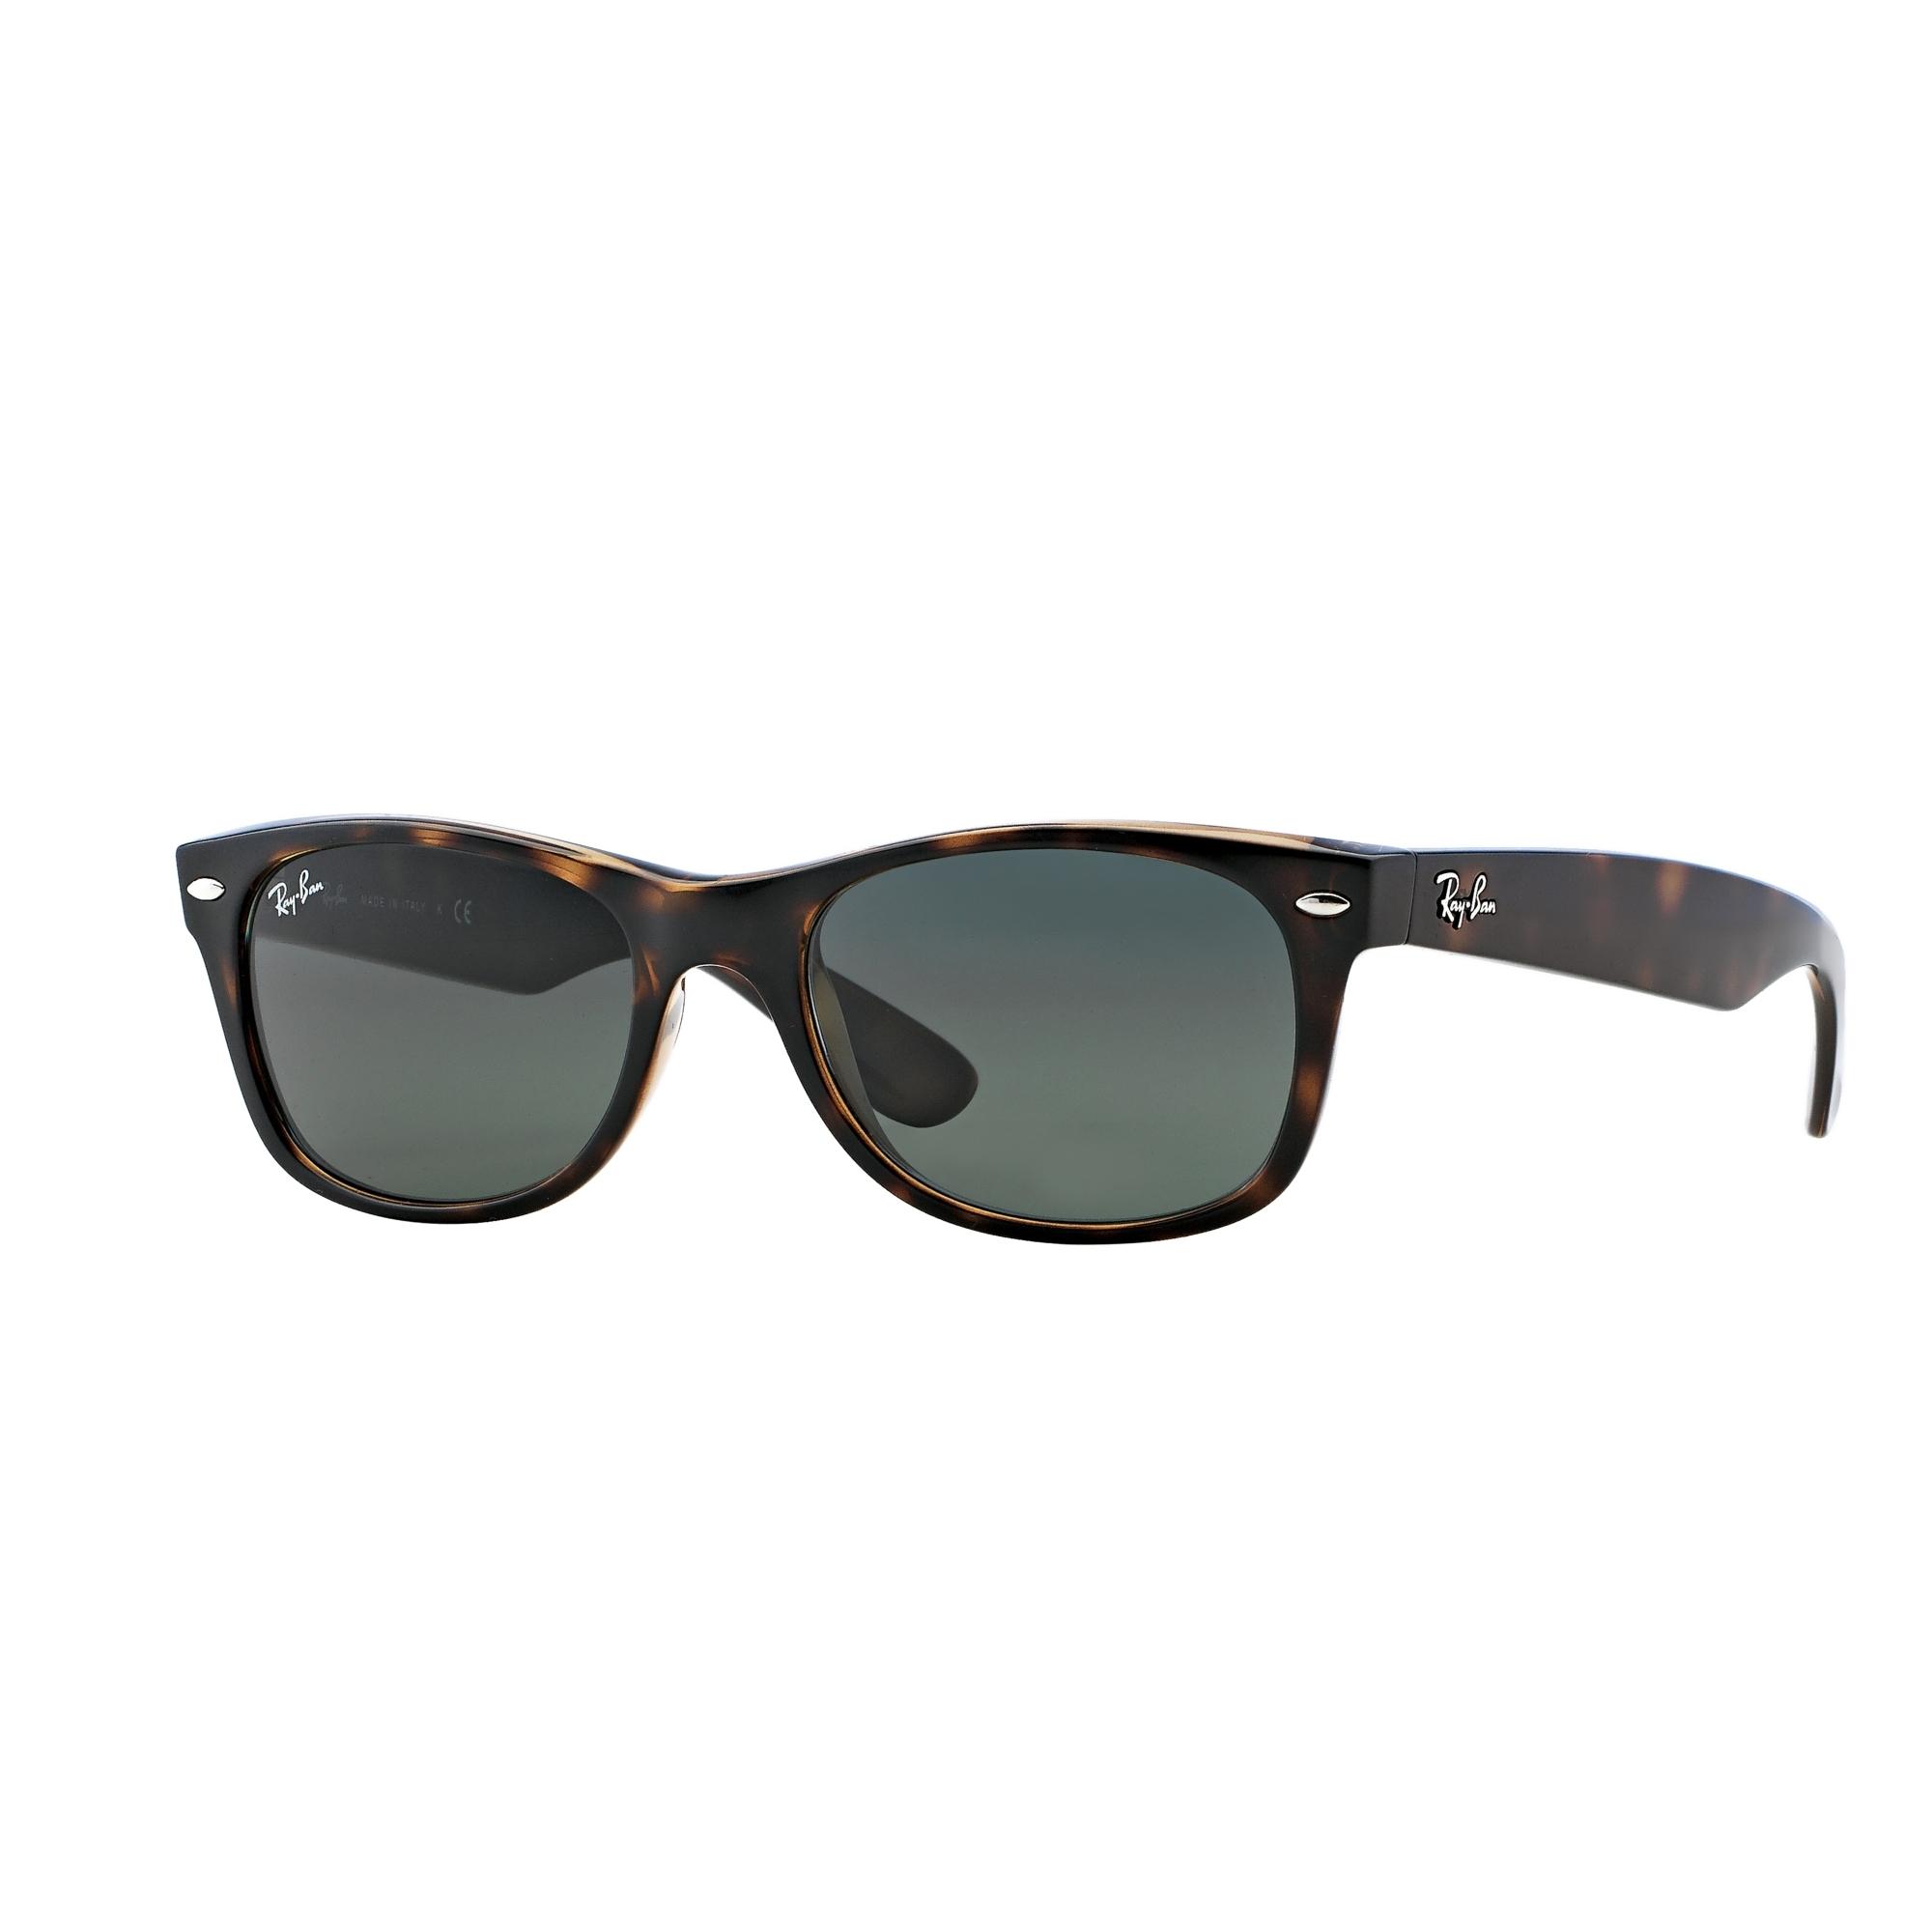 Mens Ray-Ban Tortoise Green Classic G15 New Wayfarer Classic Sunglasses  RB2132-902-52 - WATCH SHOP.™   WatchShop.com™ 6a461660ce71